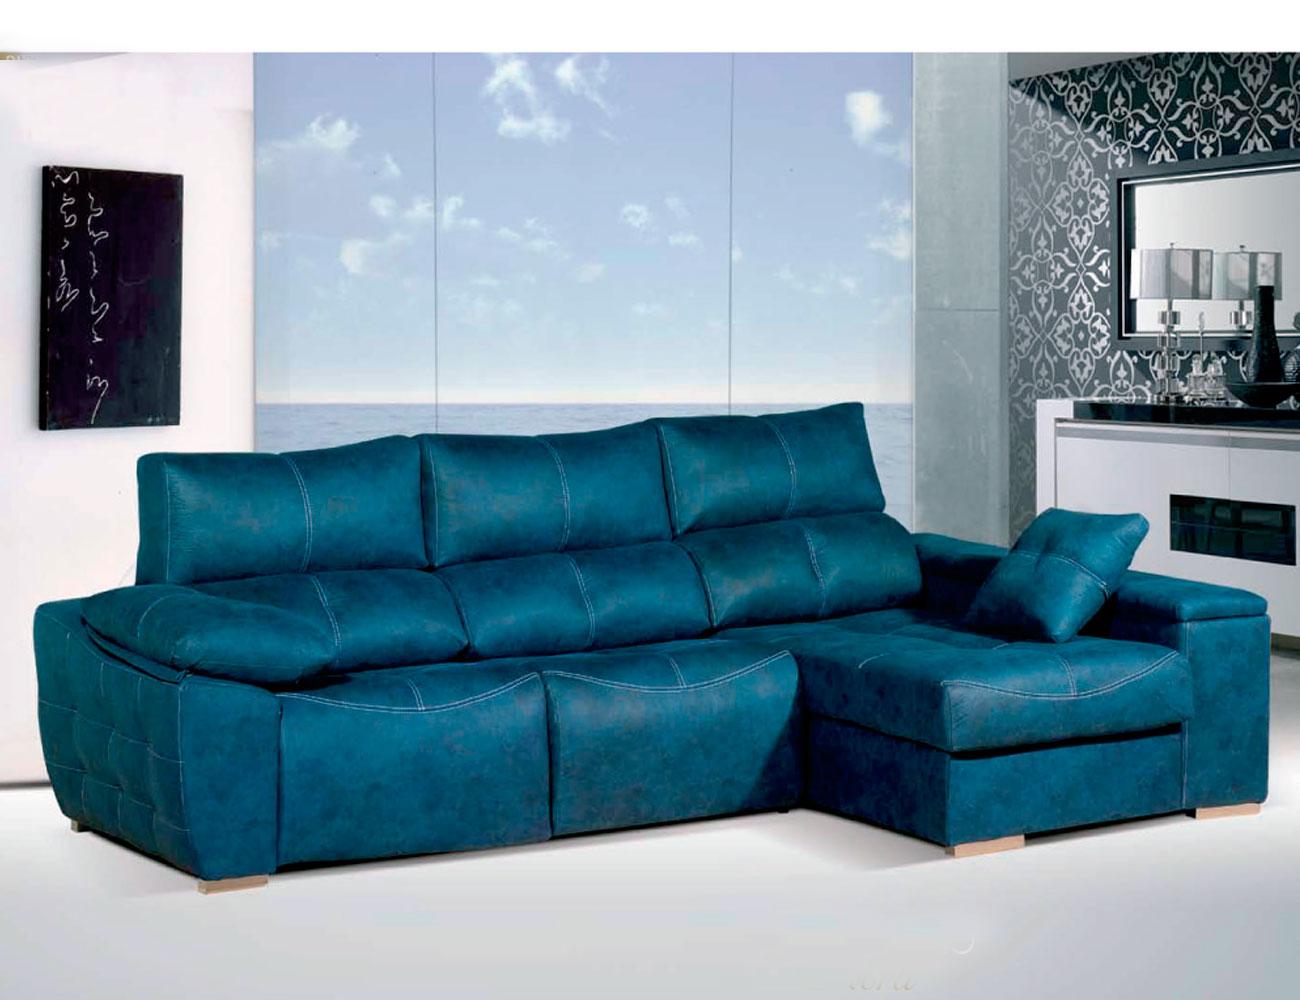 Sof chaiselongue con tejido anti manchas aqualine 9483 for Chaise longue azul turquesa